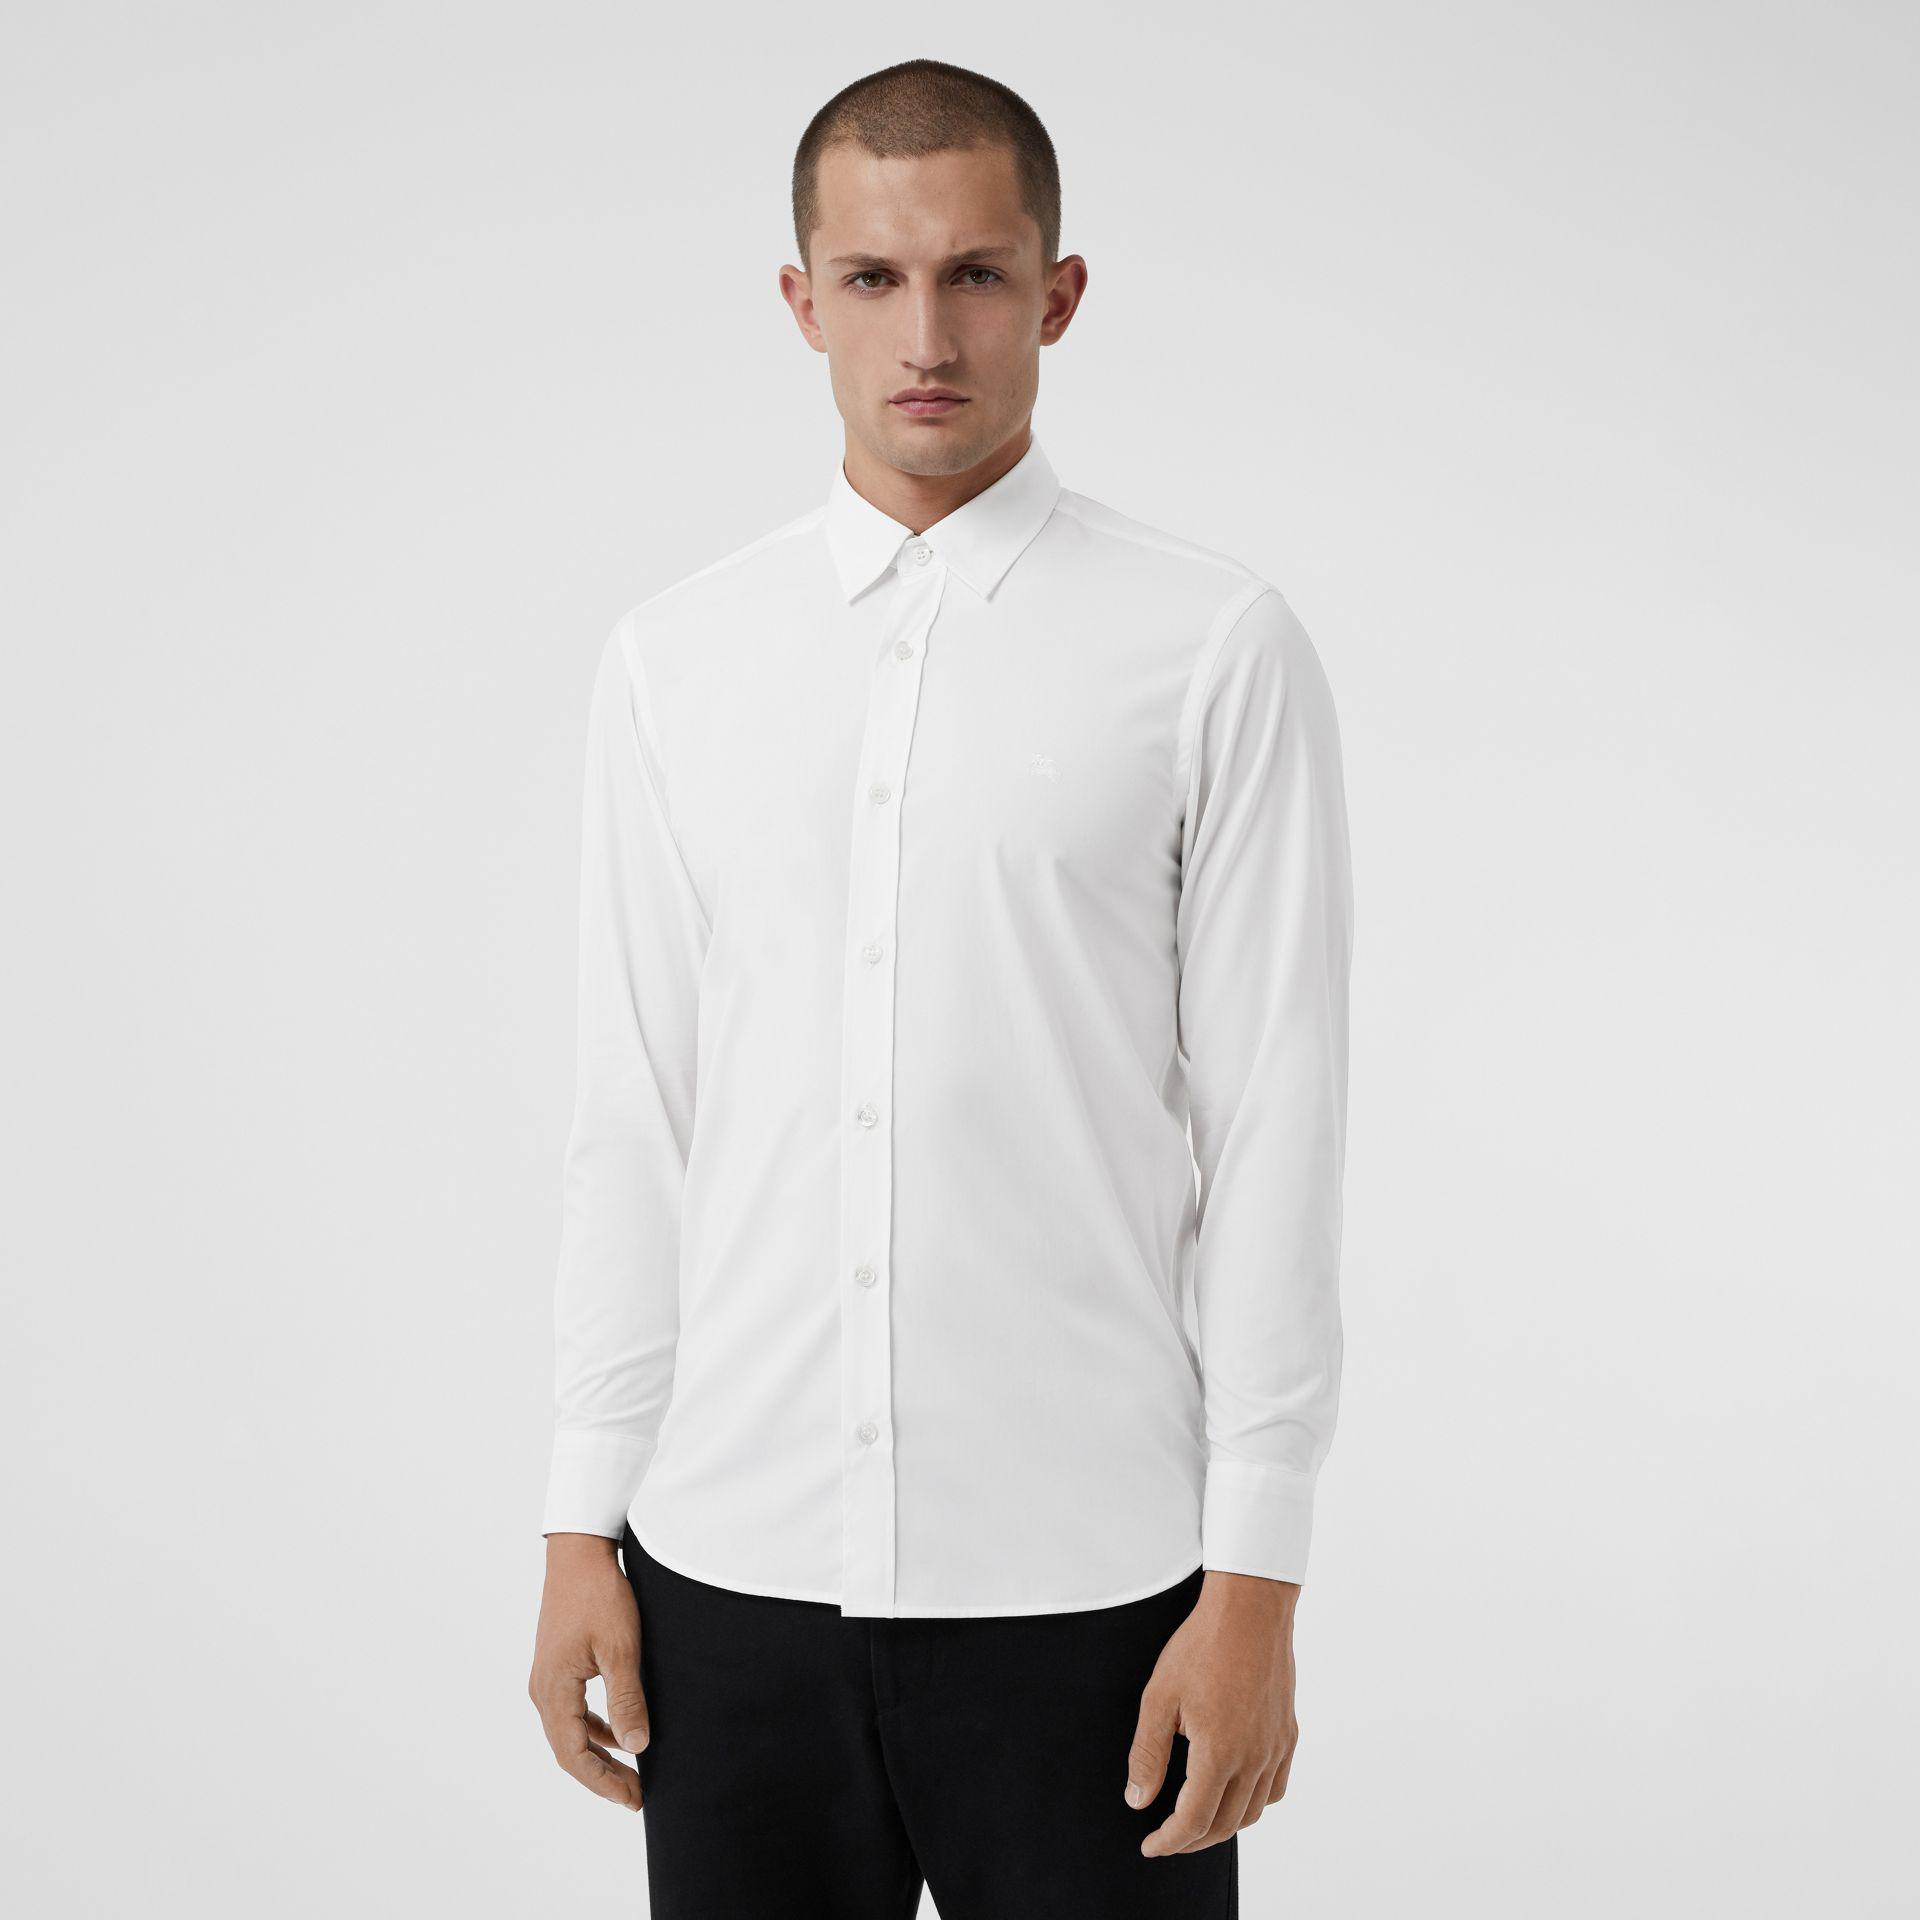 de Burberry de Camisa Blanco elástico de popelina algodón cuadros EwC86qC b0531afb106